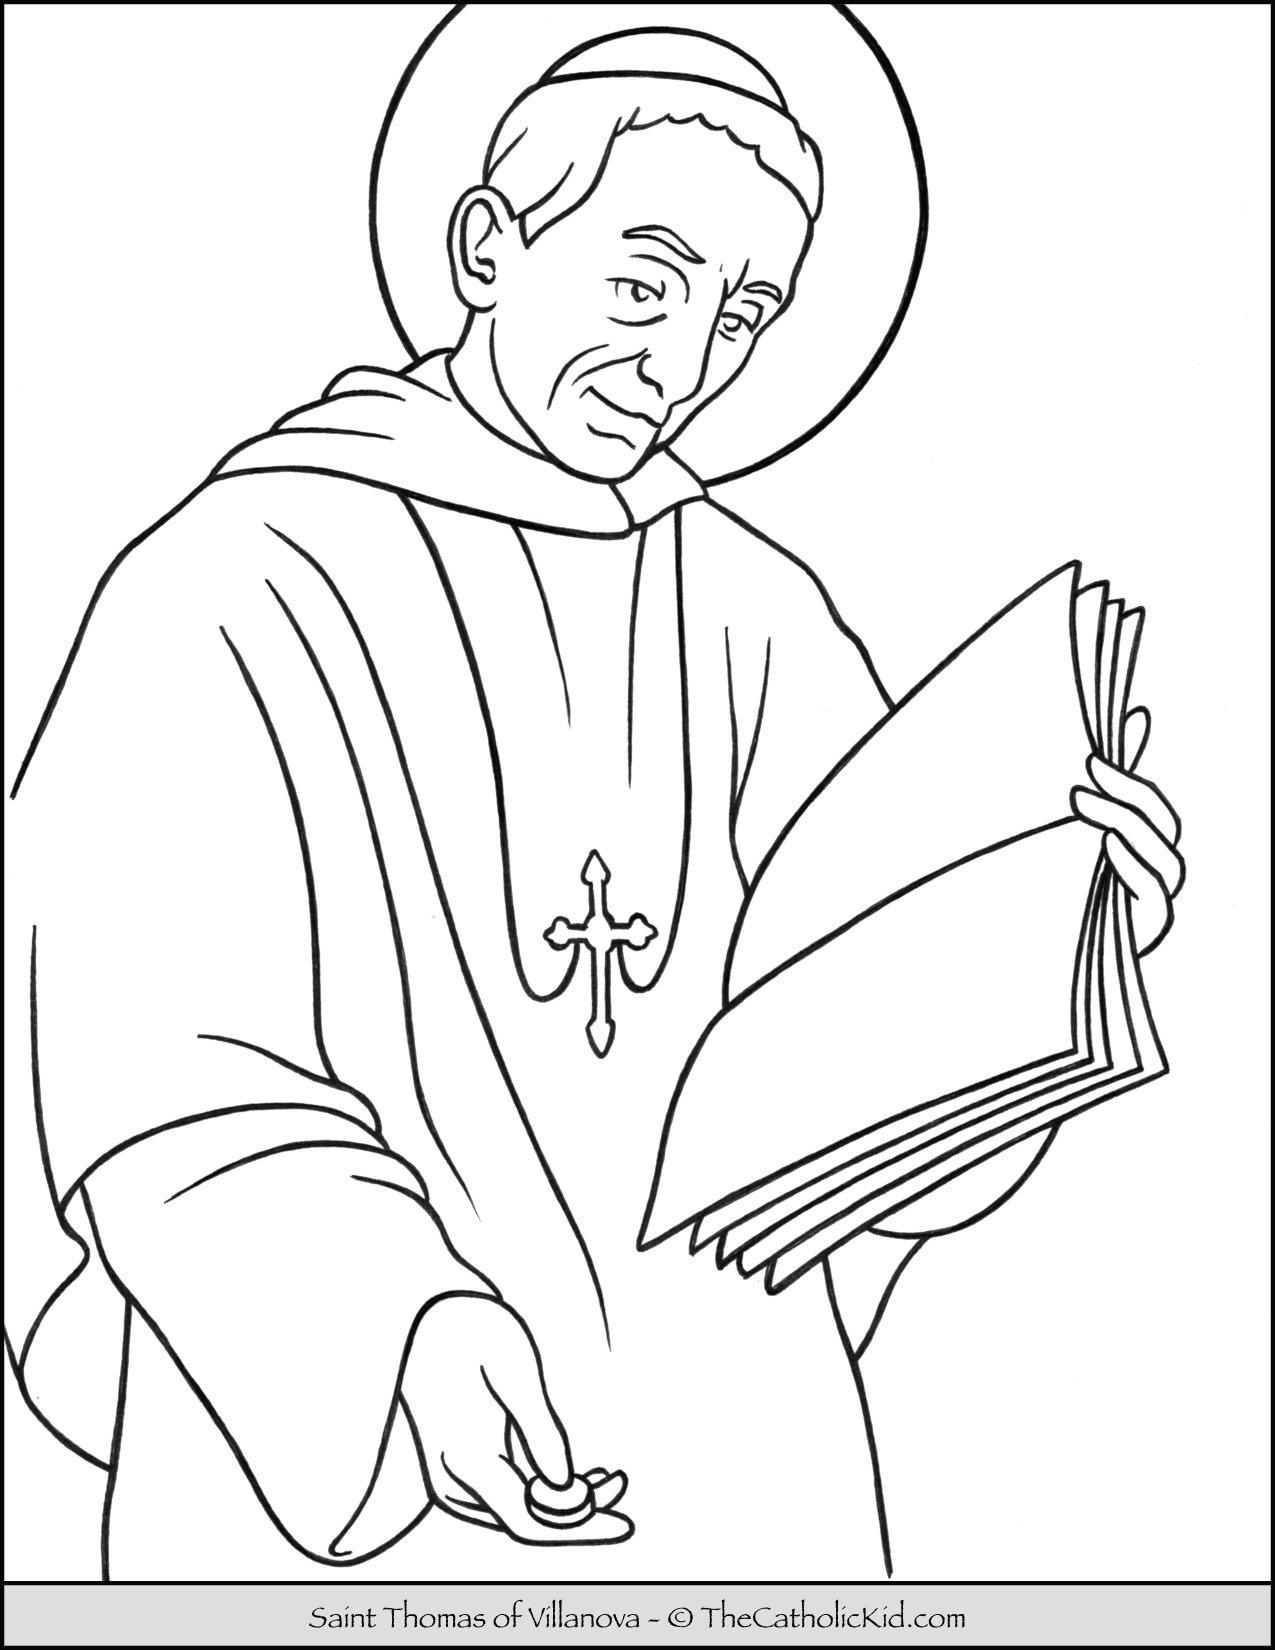 Saint Thomas of Villanova Coloring Page